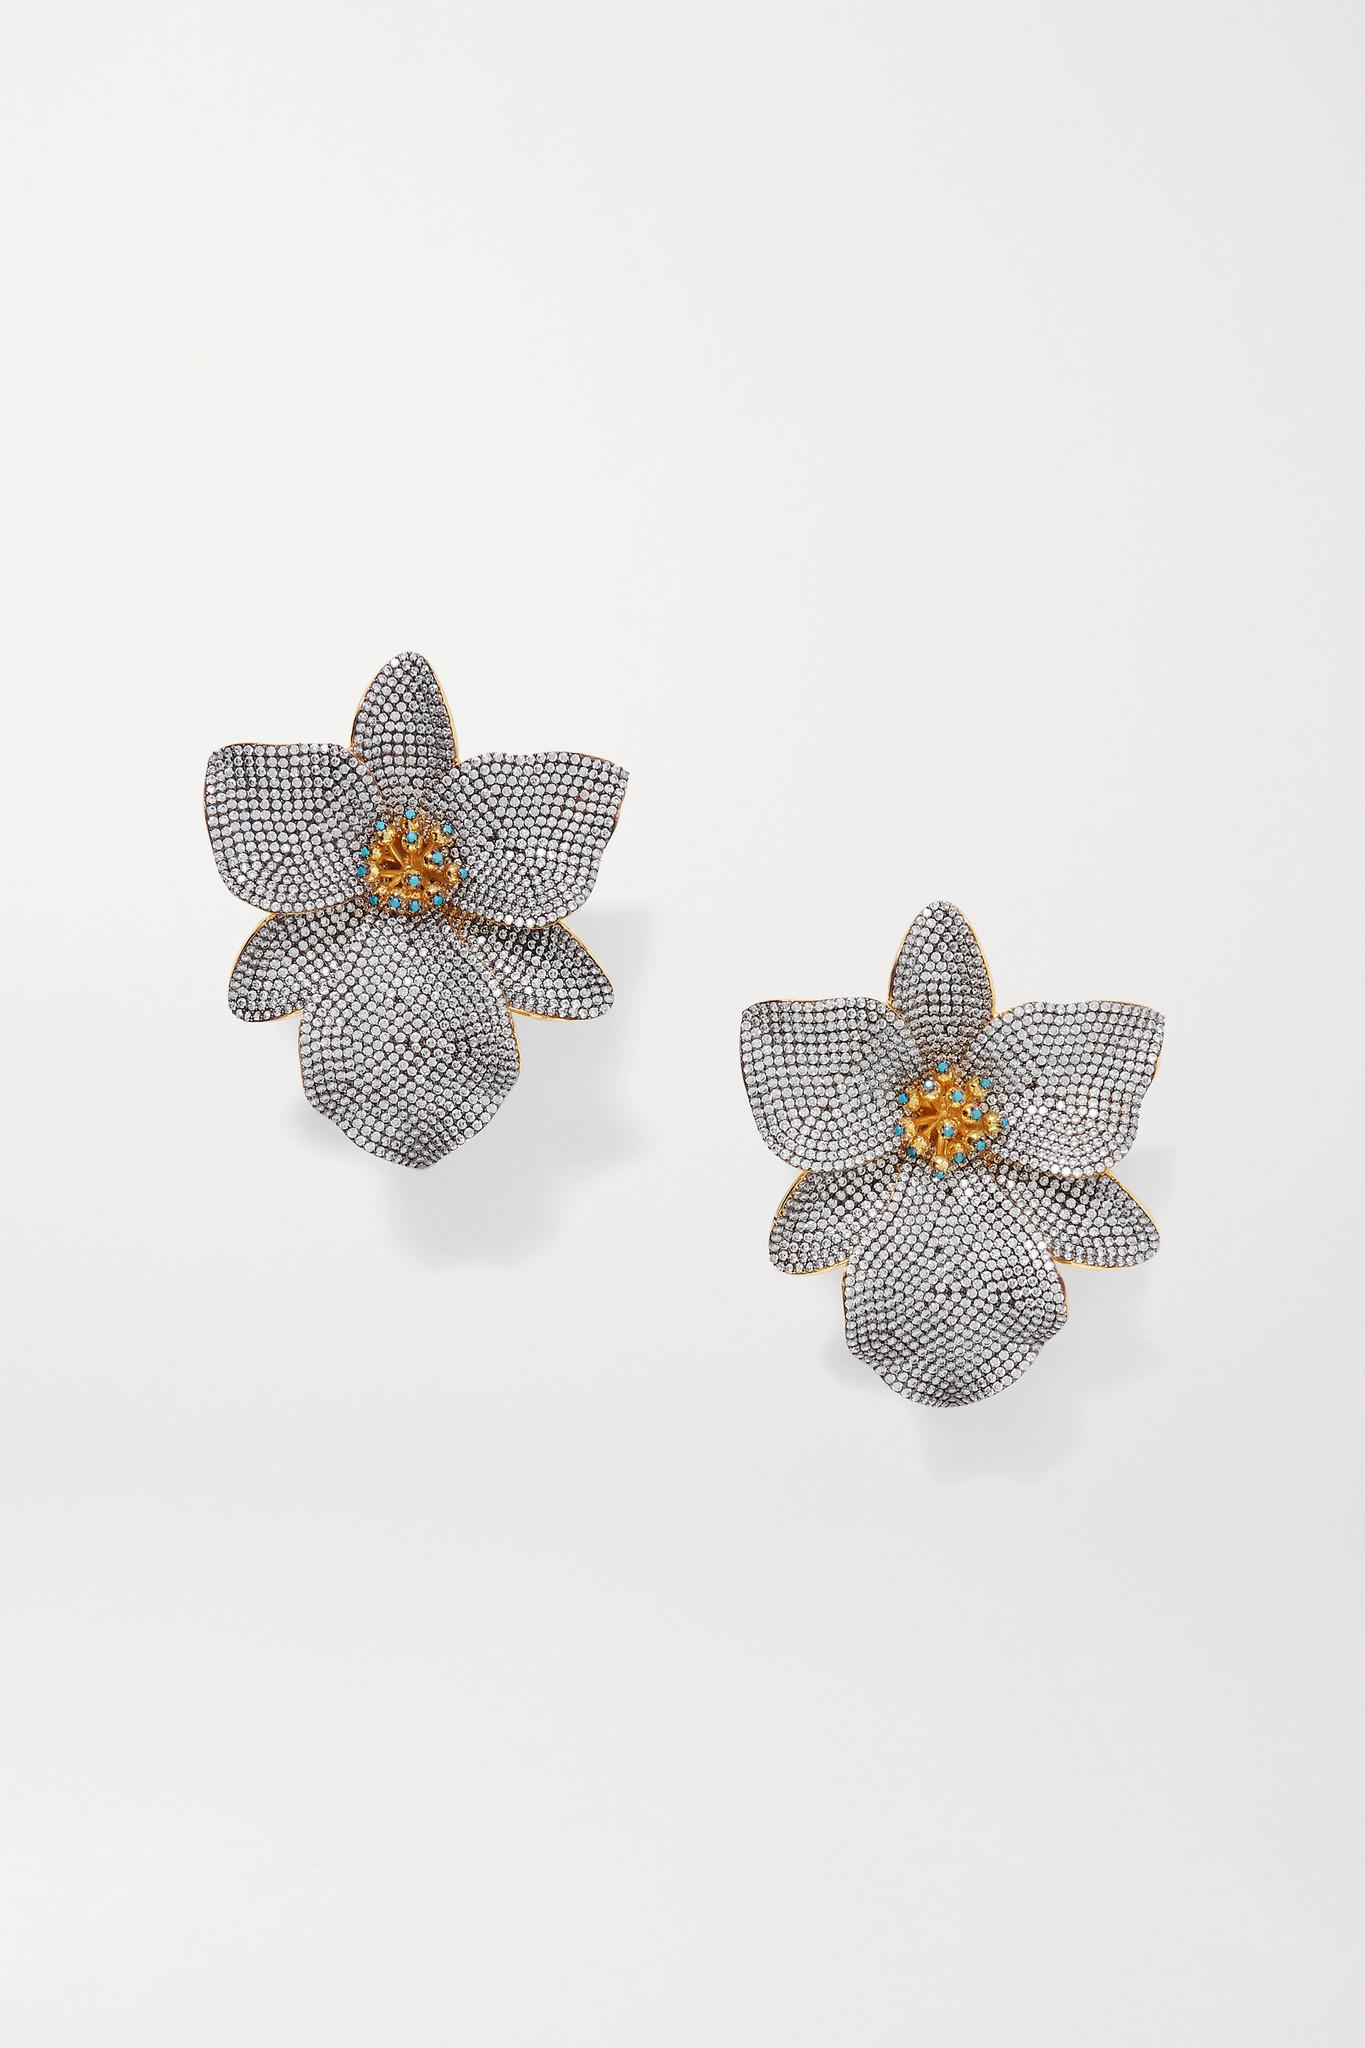 BEGÜM KHAN - Singapore Orchids 水晶、搪瓷、镀金夹扣式耳环 - 银色 - one size